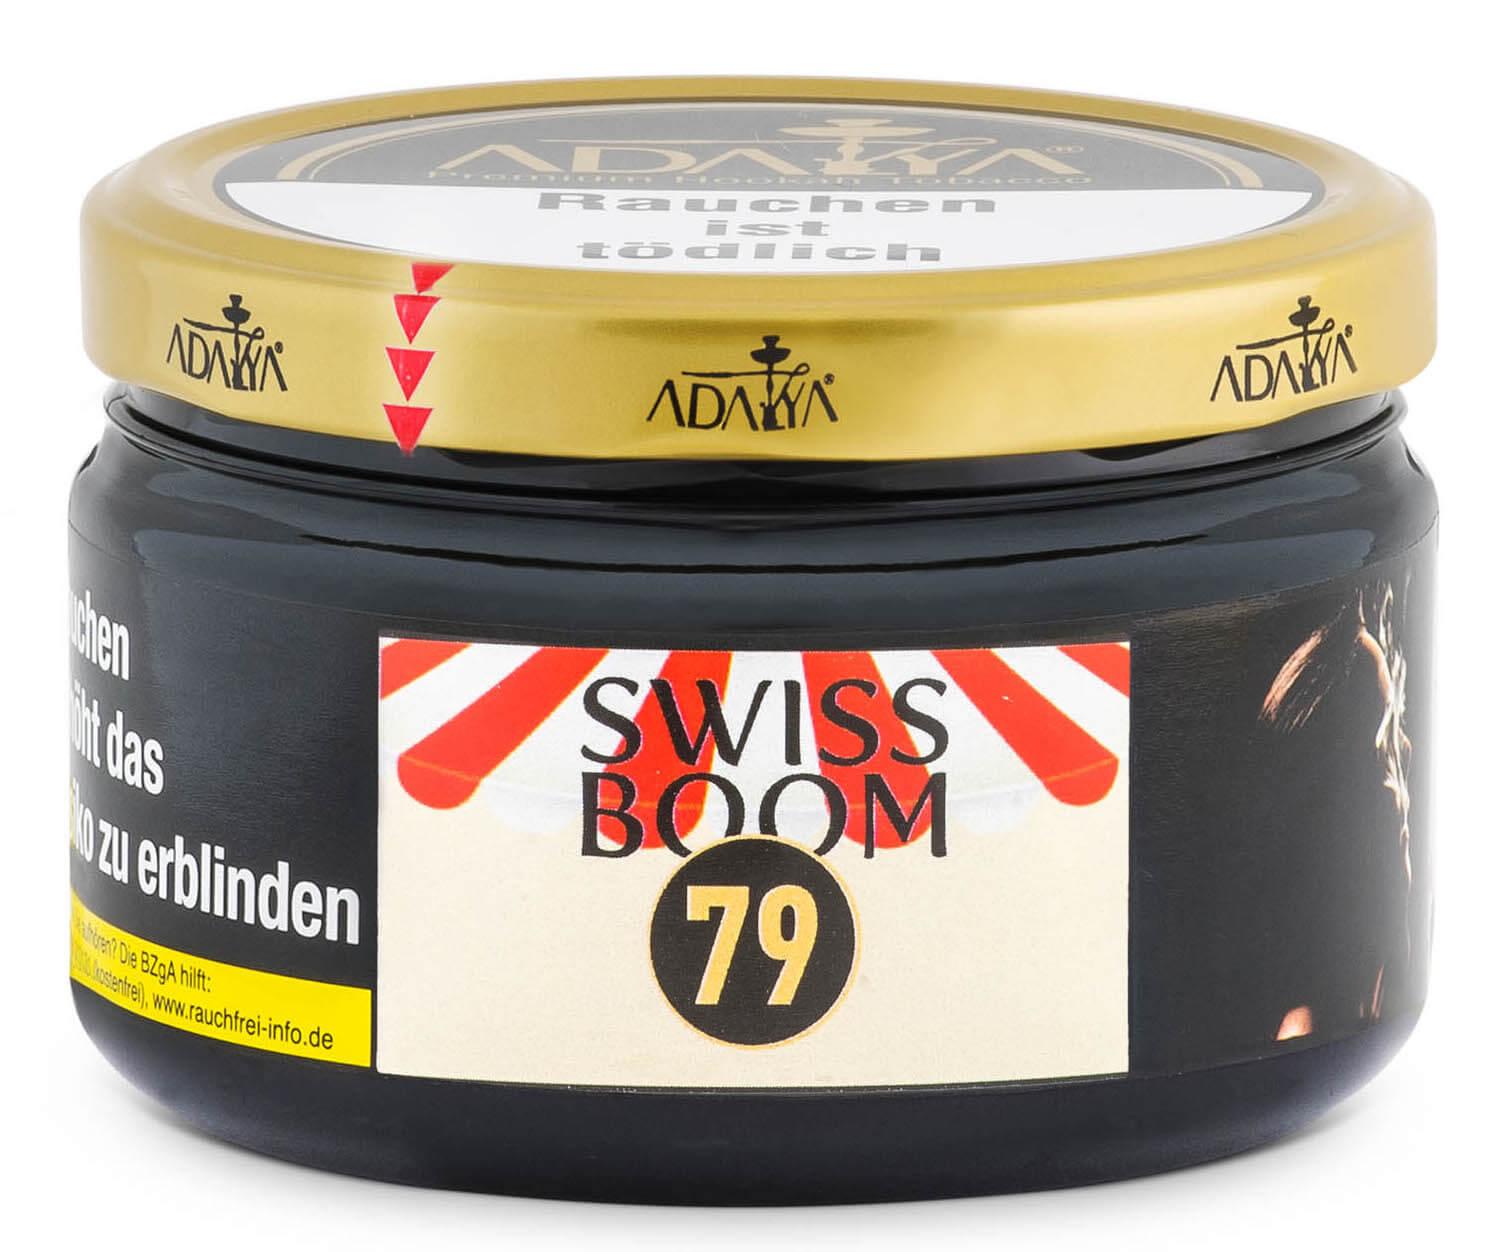 Adalya Tabak Swiss Boom #79 200g